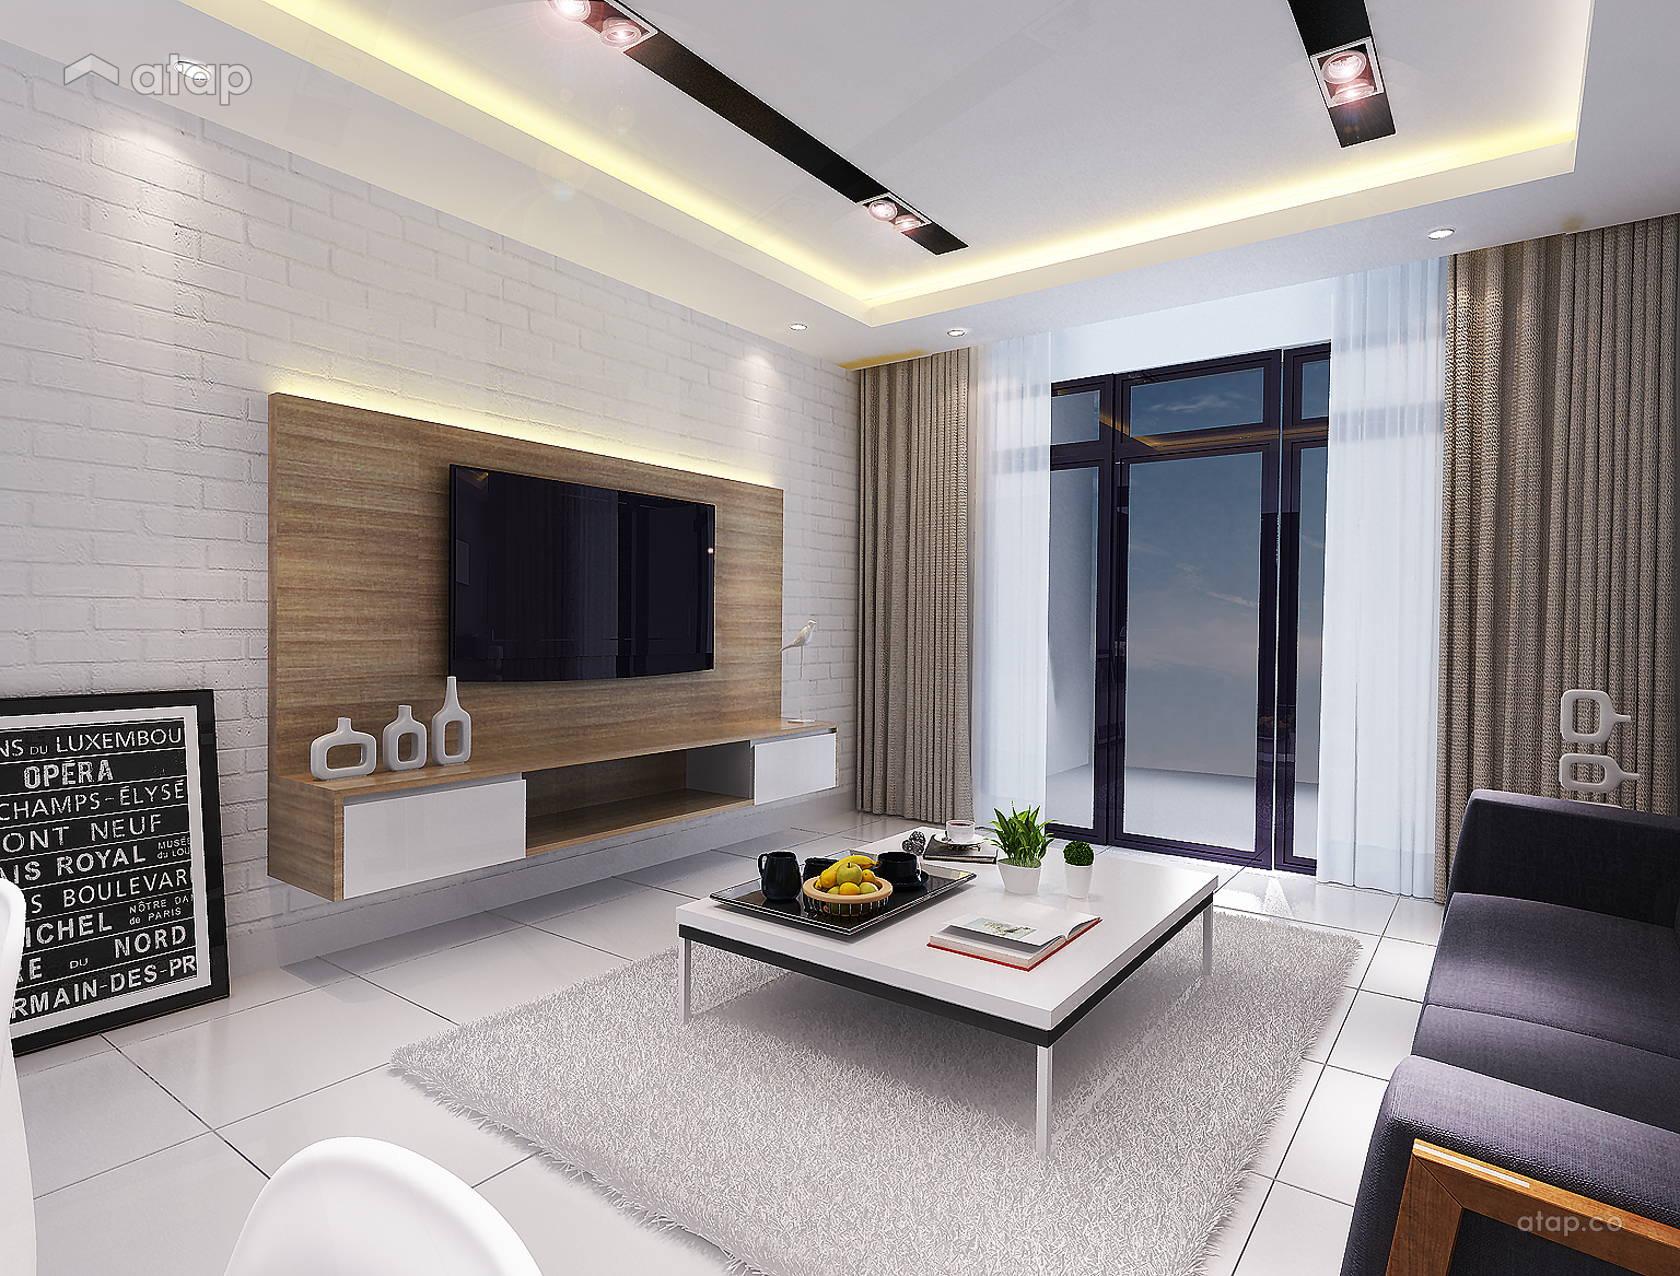 The Charlton, EcoSummer interior design renovation ideas ...